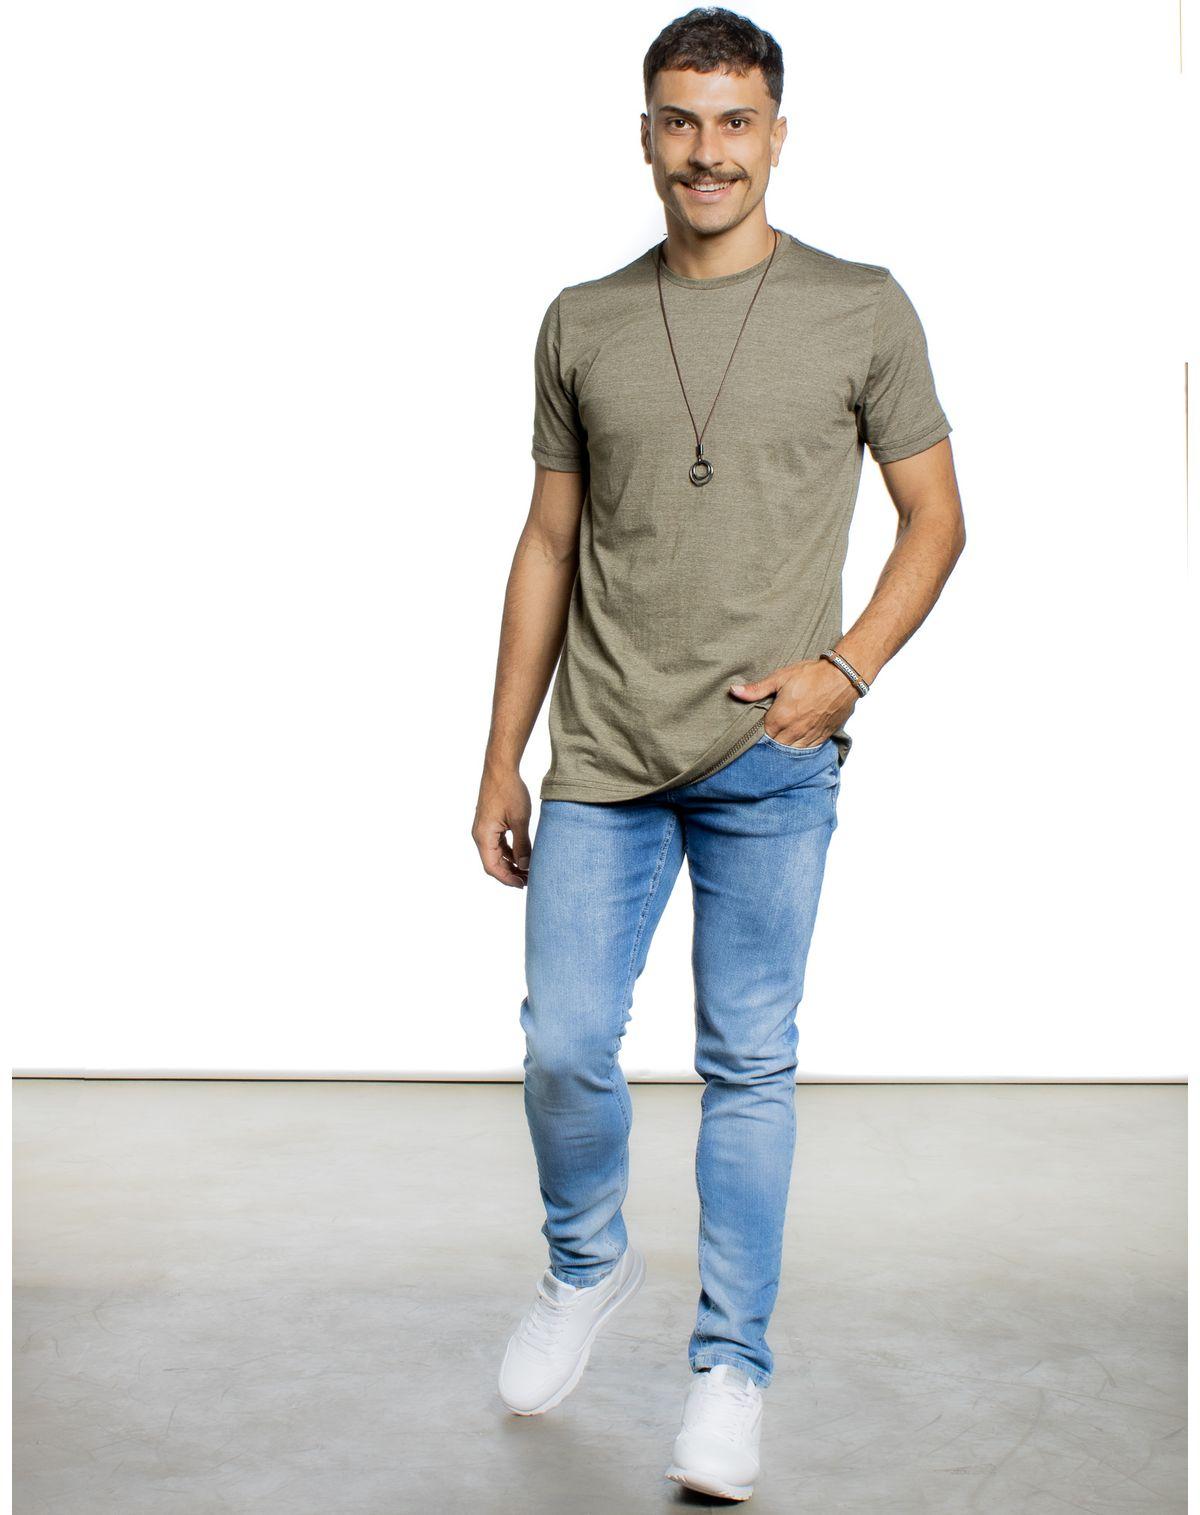 587120002-calca-skinny-jeans-masculina-bolsos-jeans-40-7ff